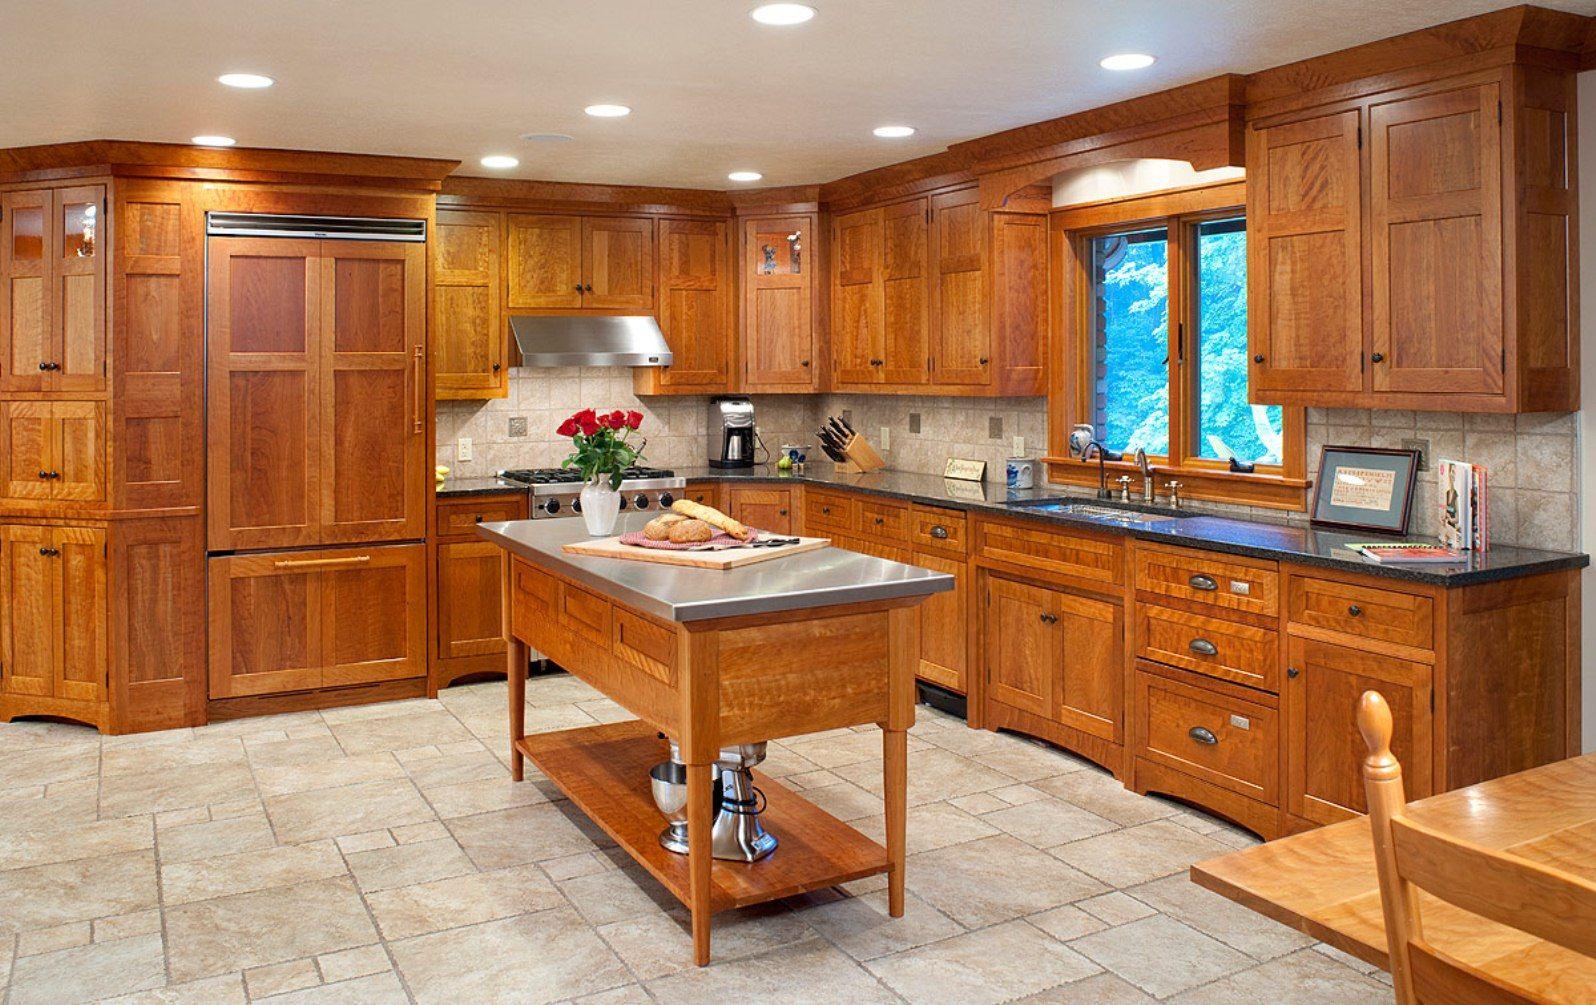 Kitchen Cabinets Dayton Ohio Amish Kitchen Cabinets Ohio Cabinets Matttroy